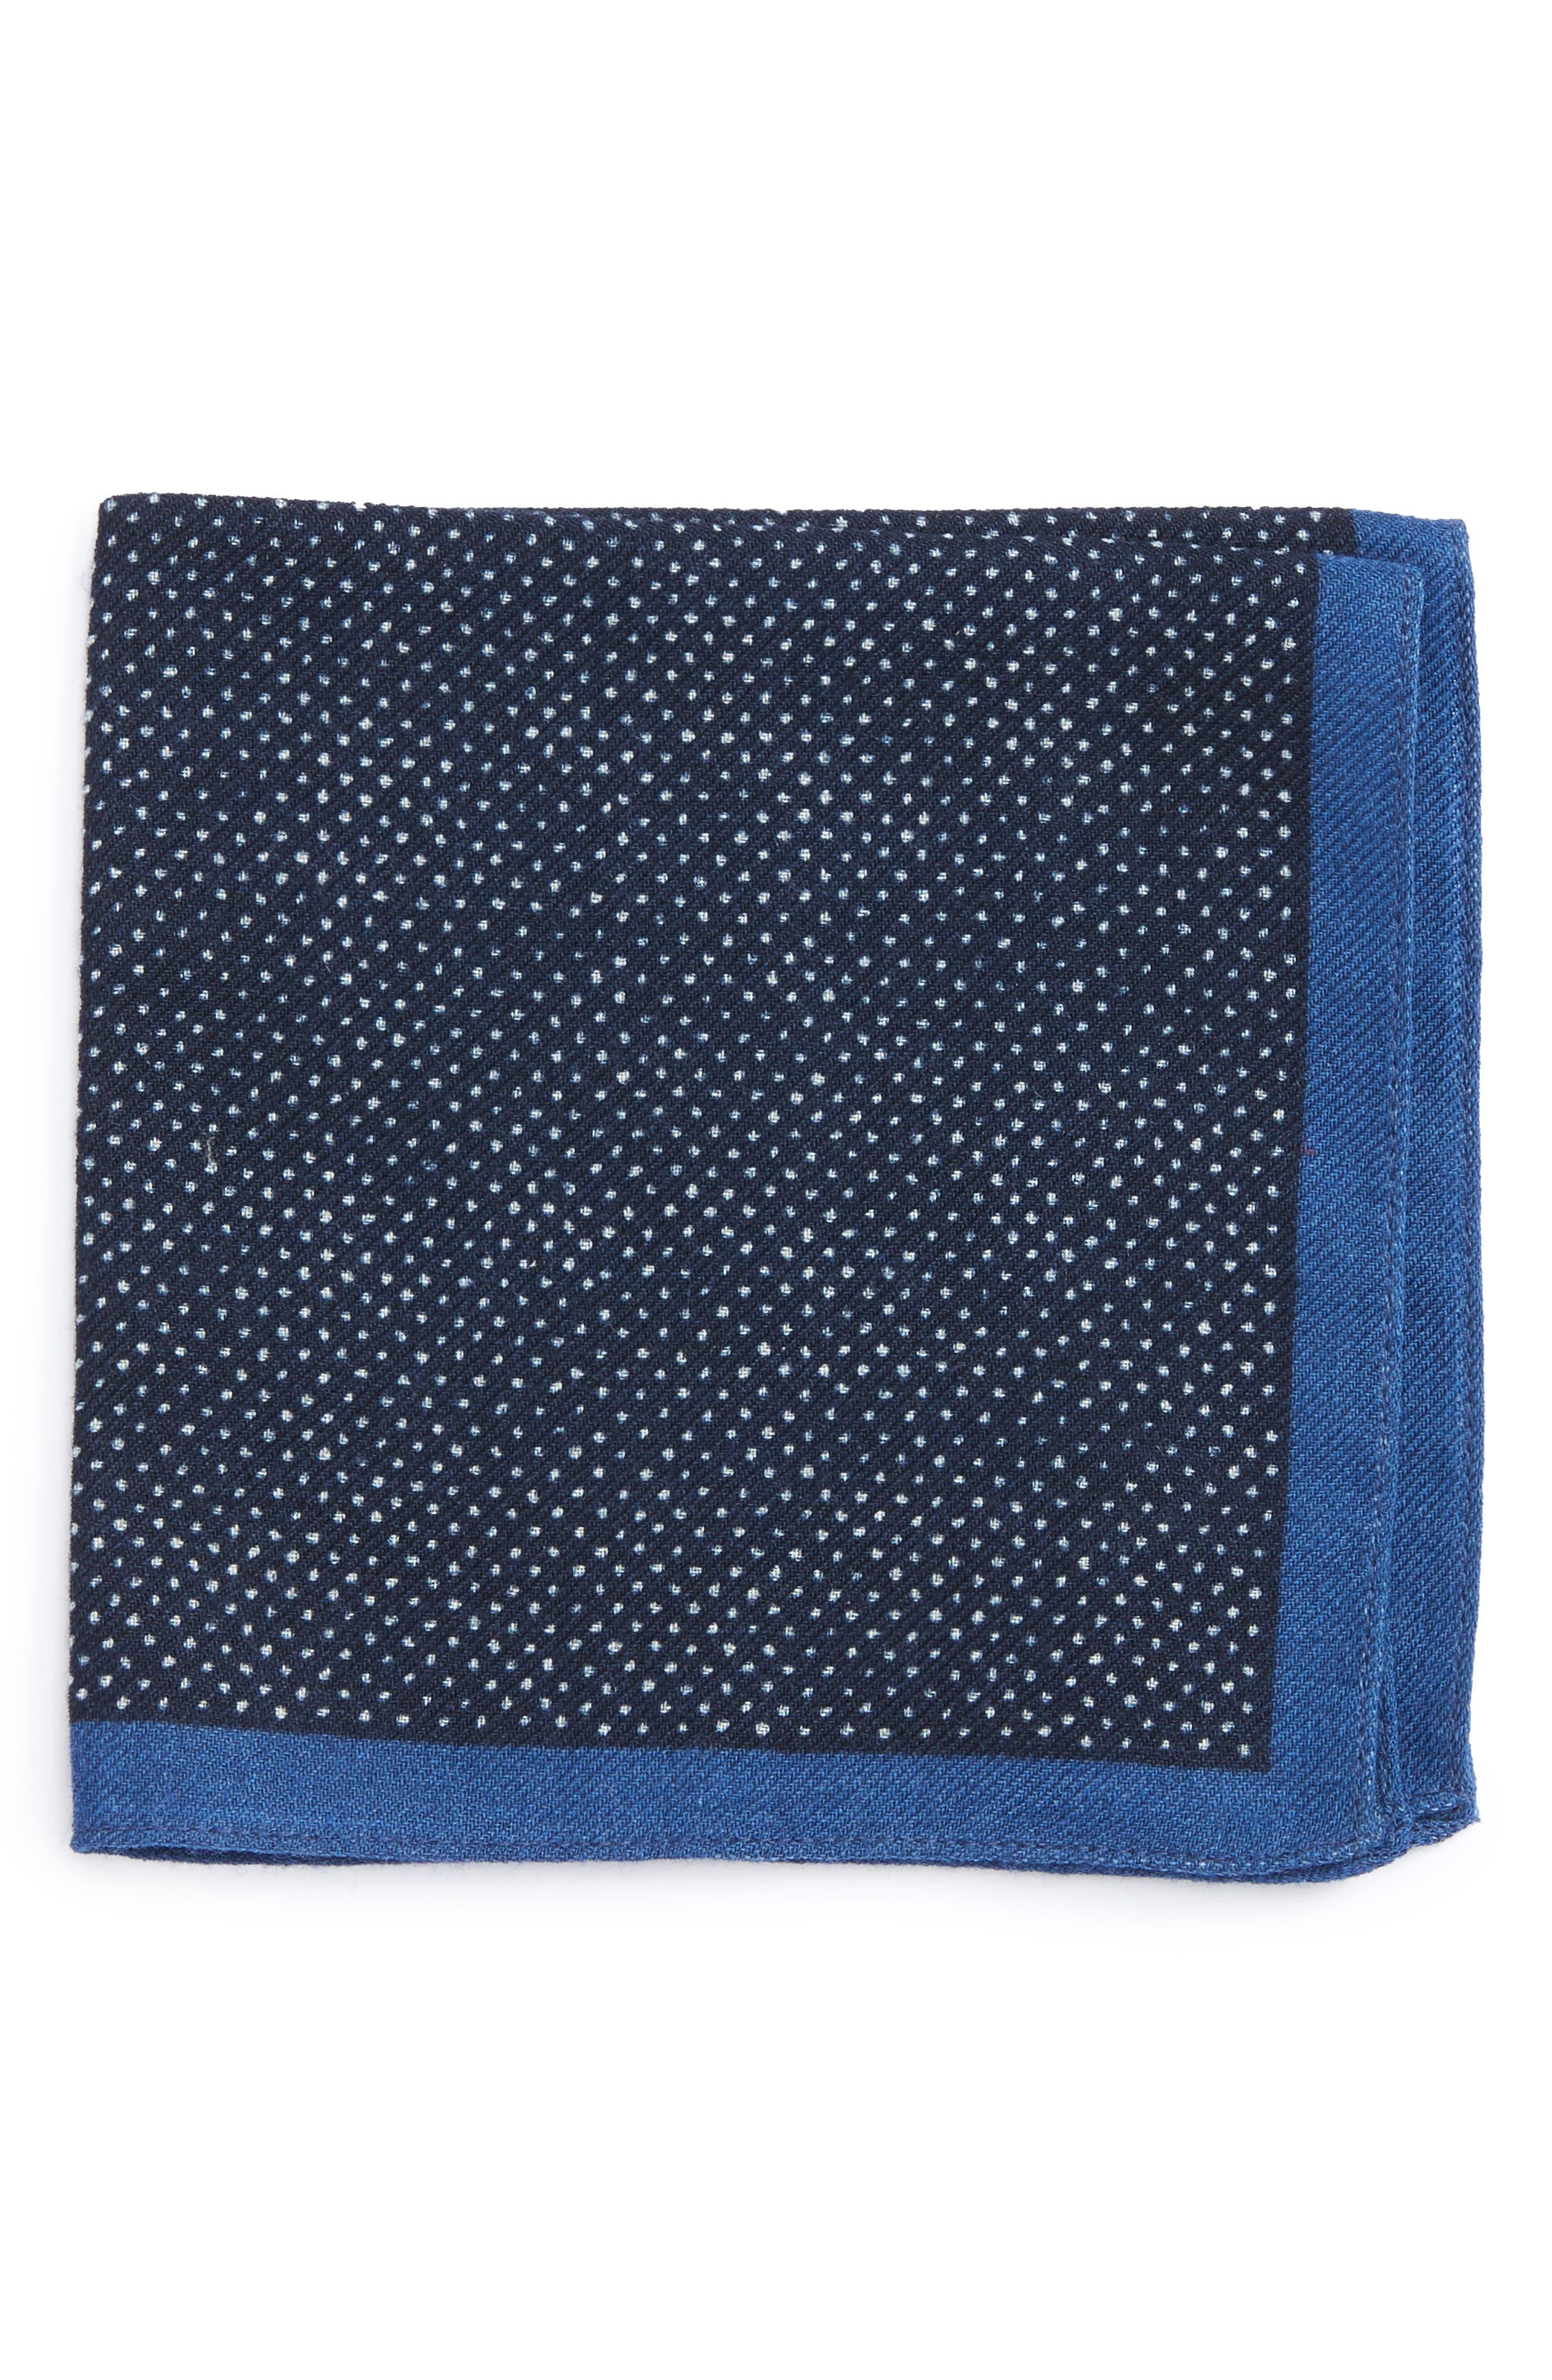 BOSS Dot Wool Pocket Square